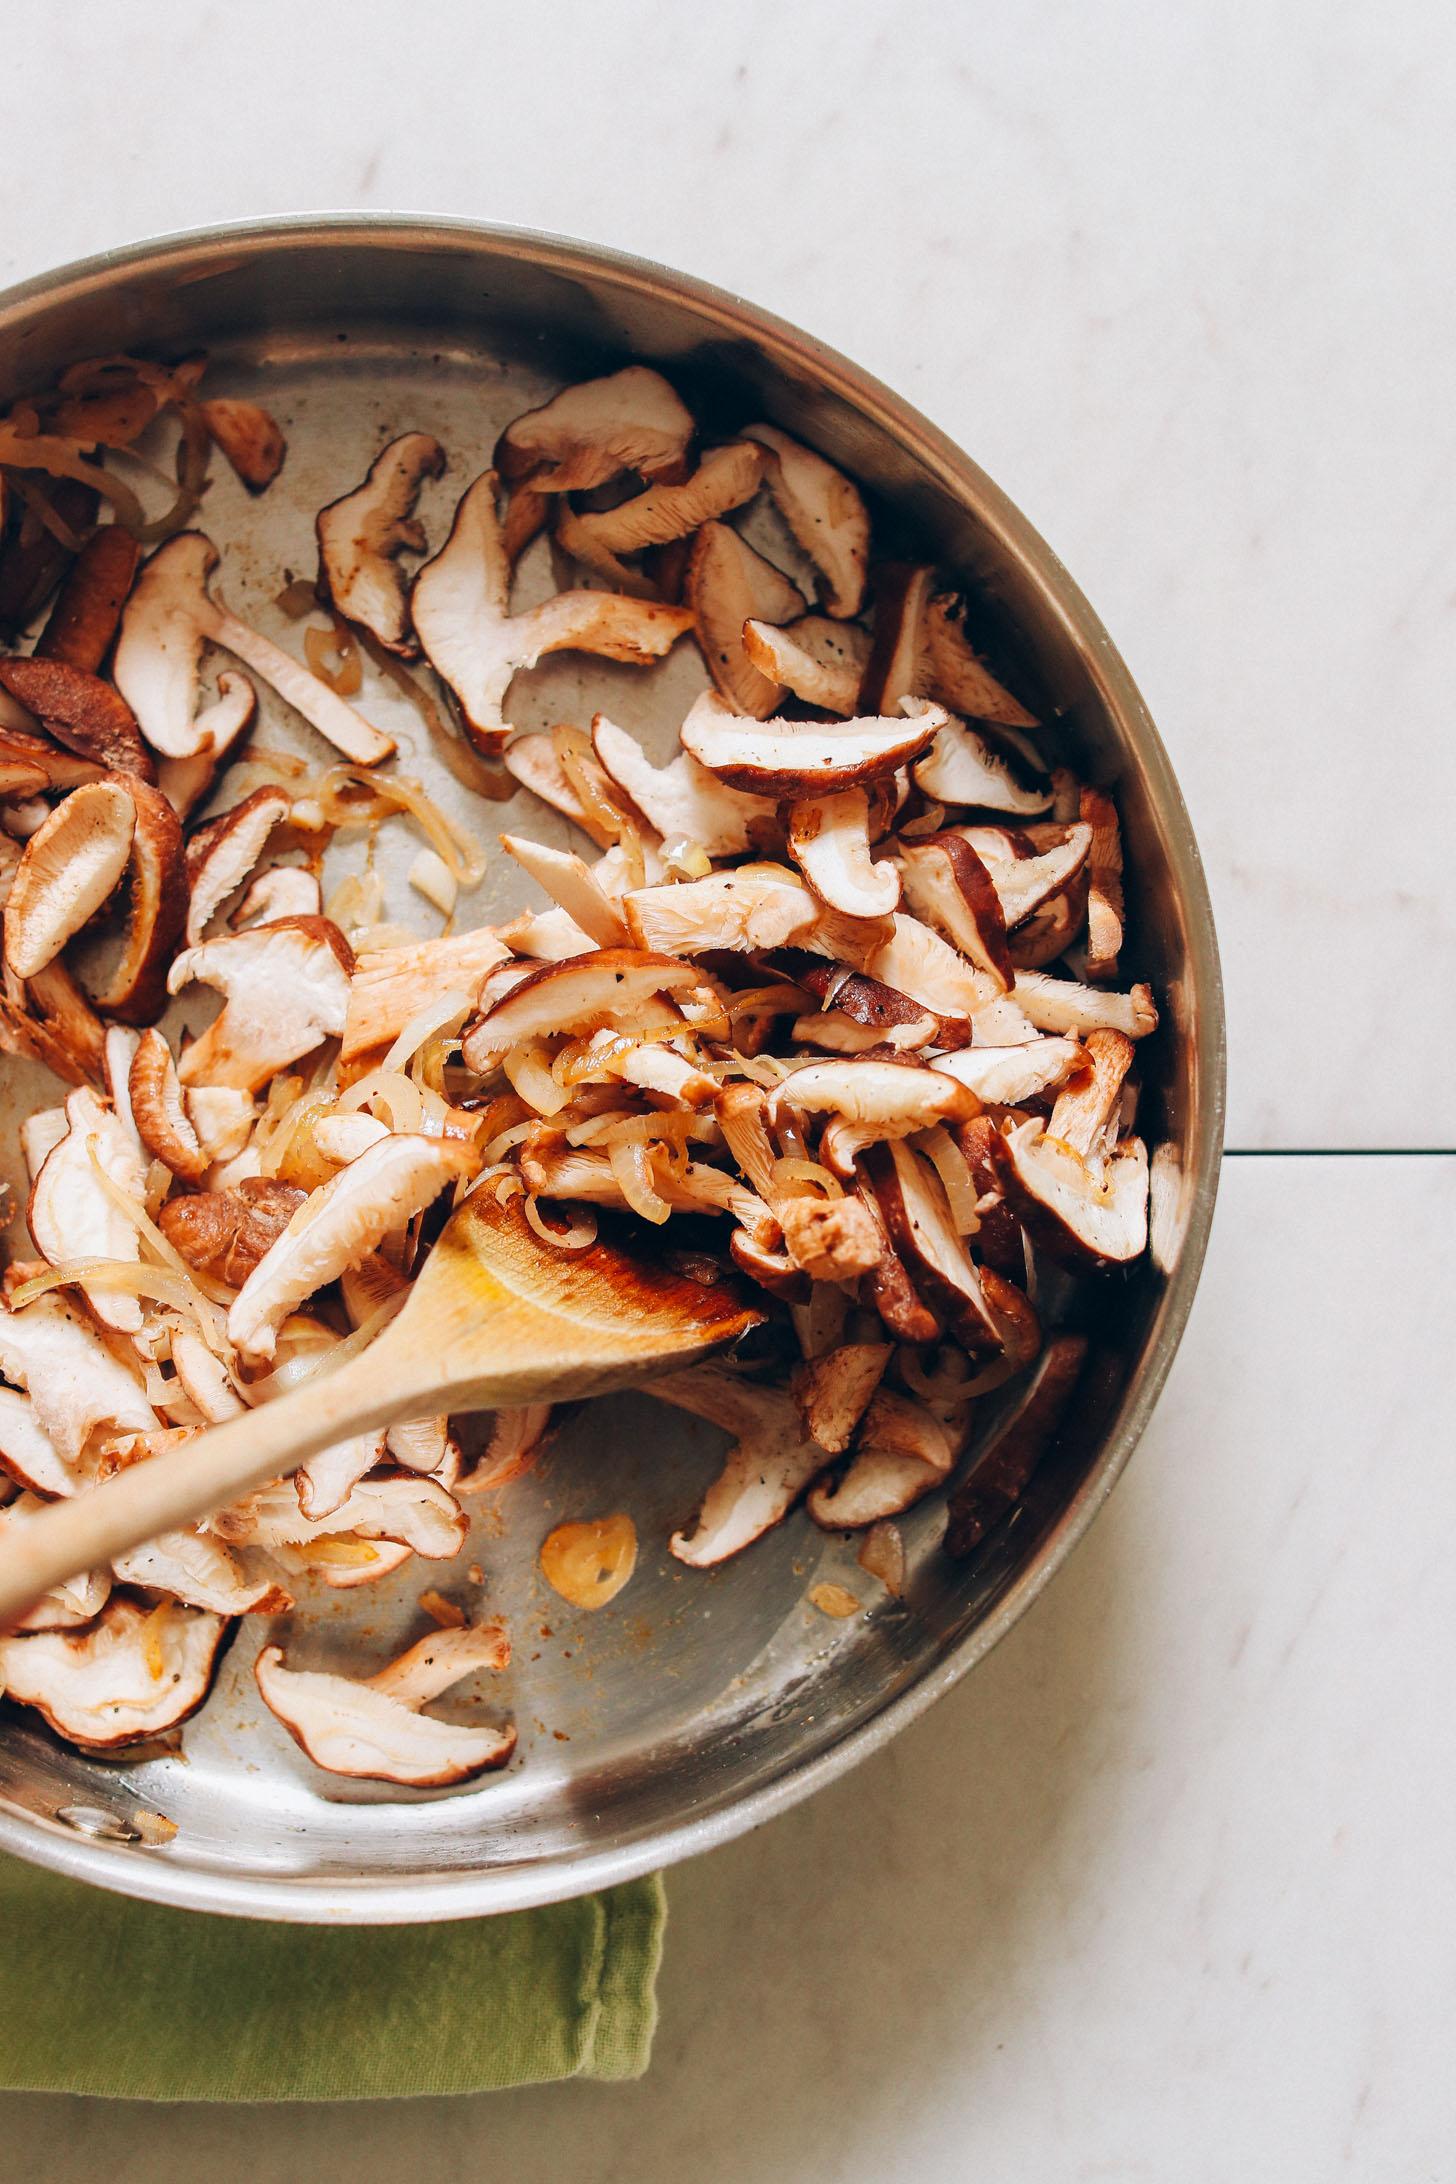 Sautéing shitake mushrooms for homemade gluten-free vegan risotto